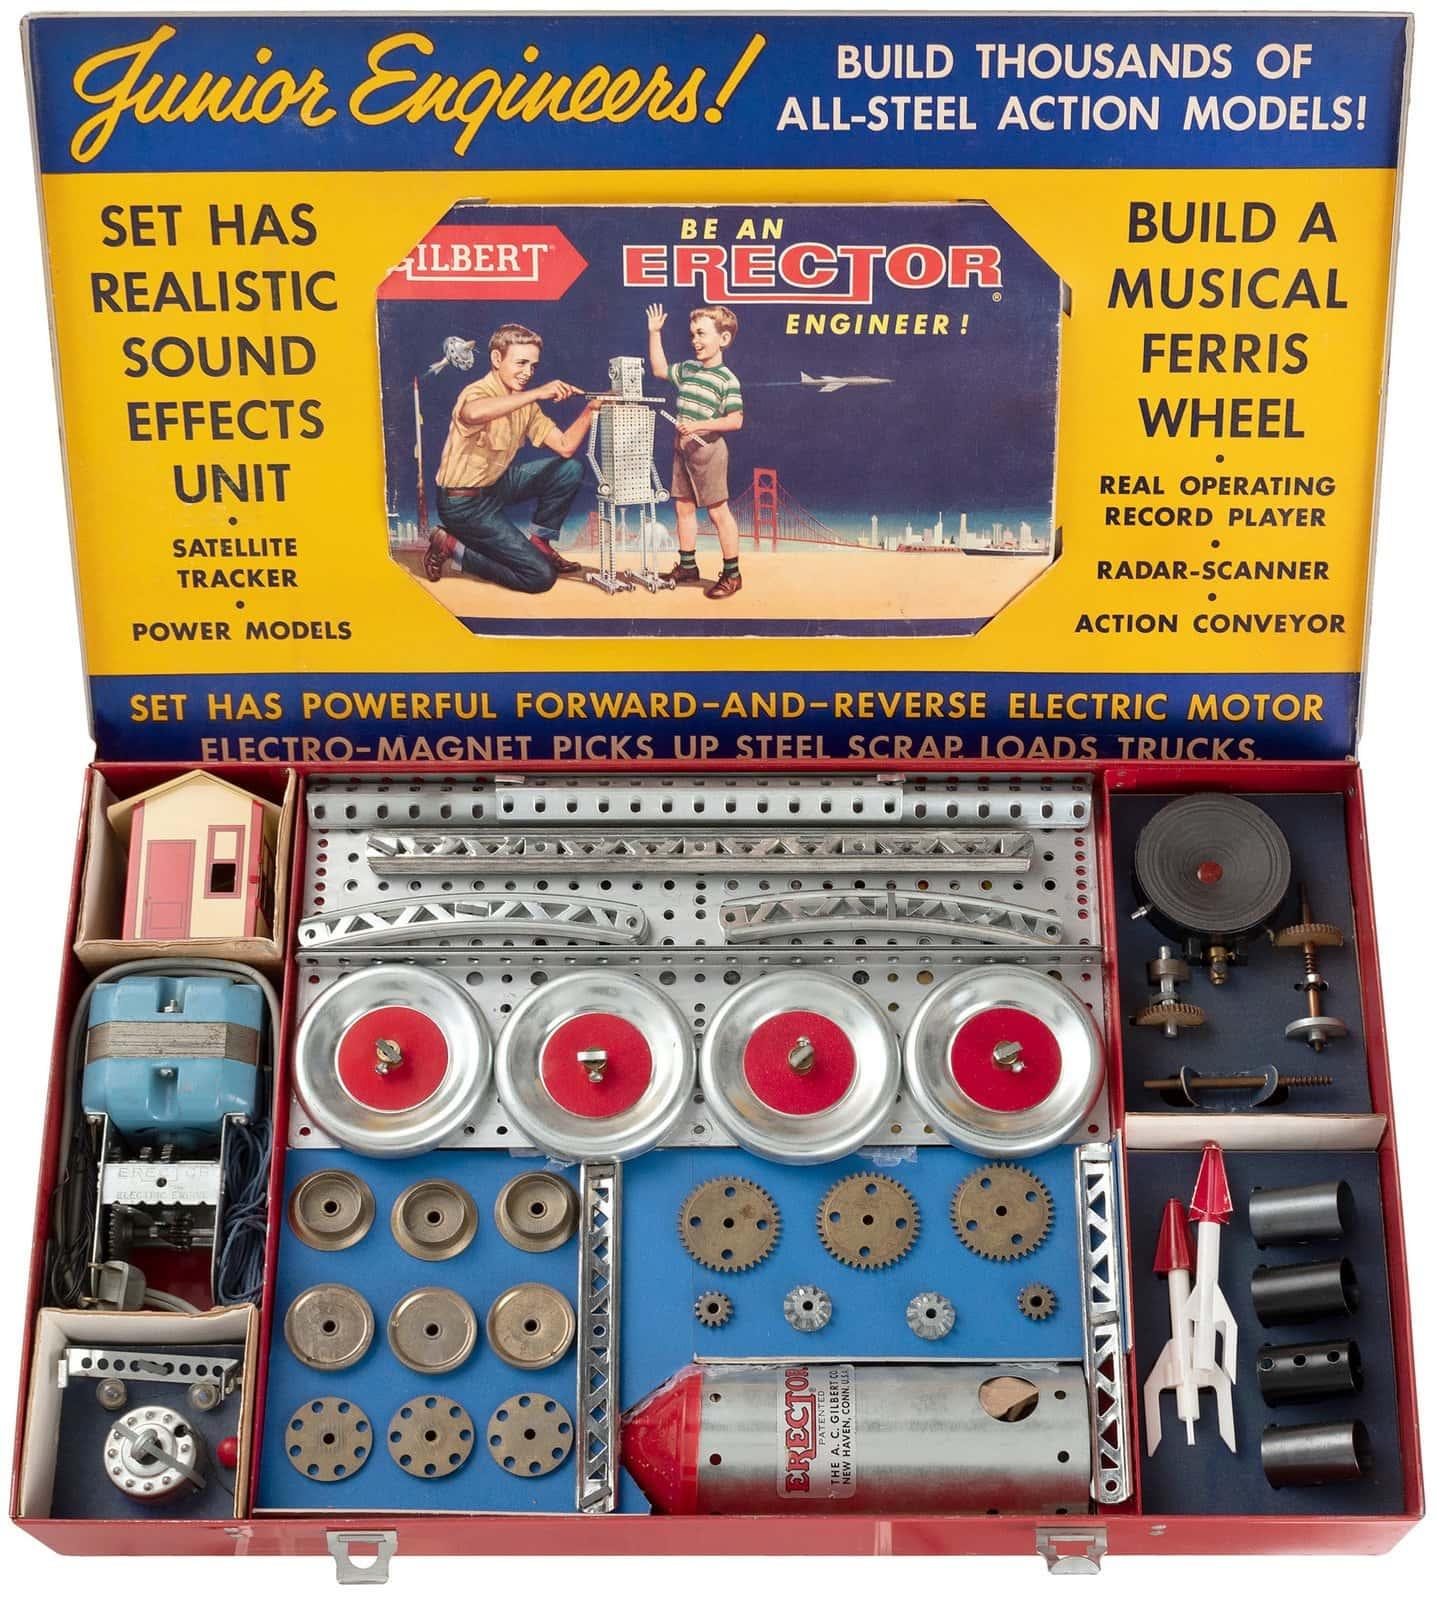 Vintage 1959 Gilbert Erector Set toy - Musical Ferris Wheel